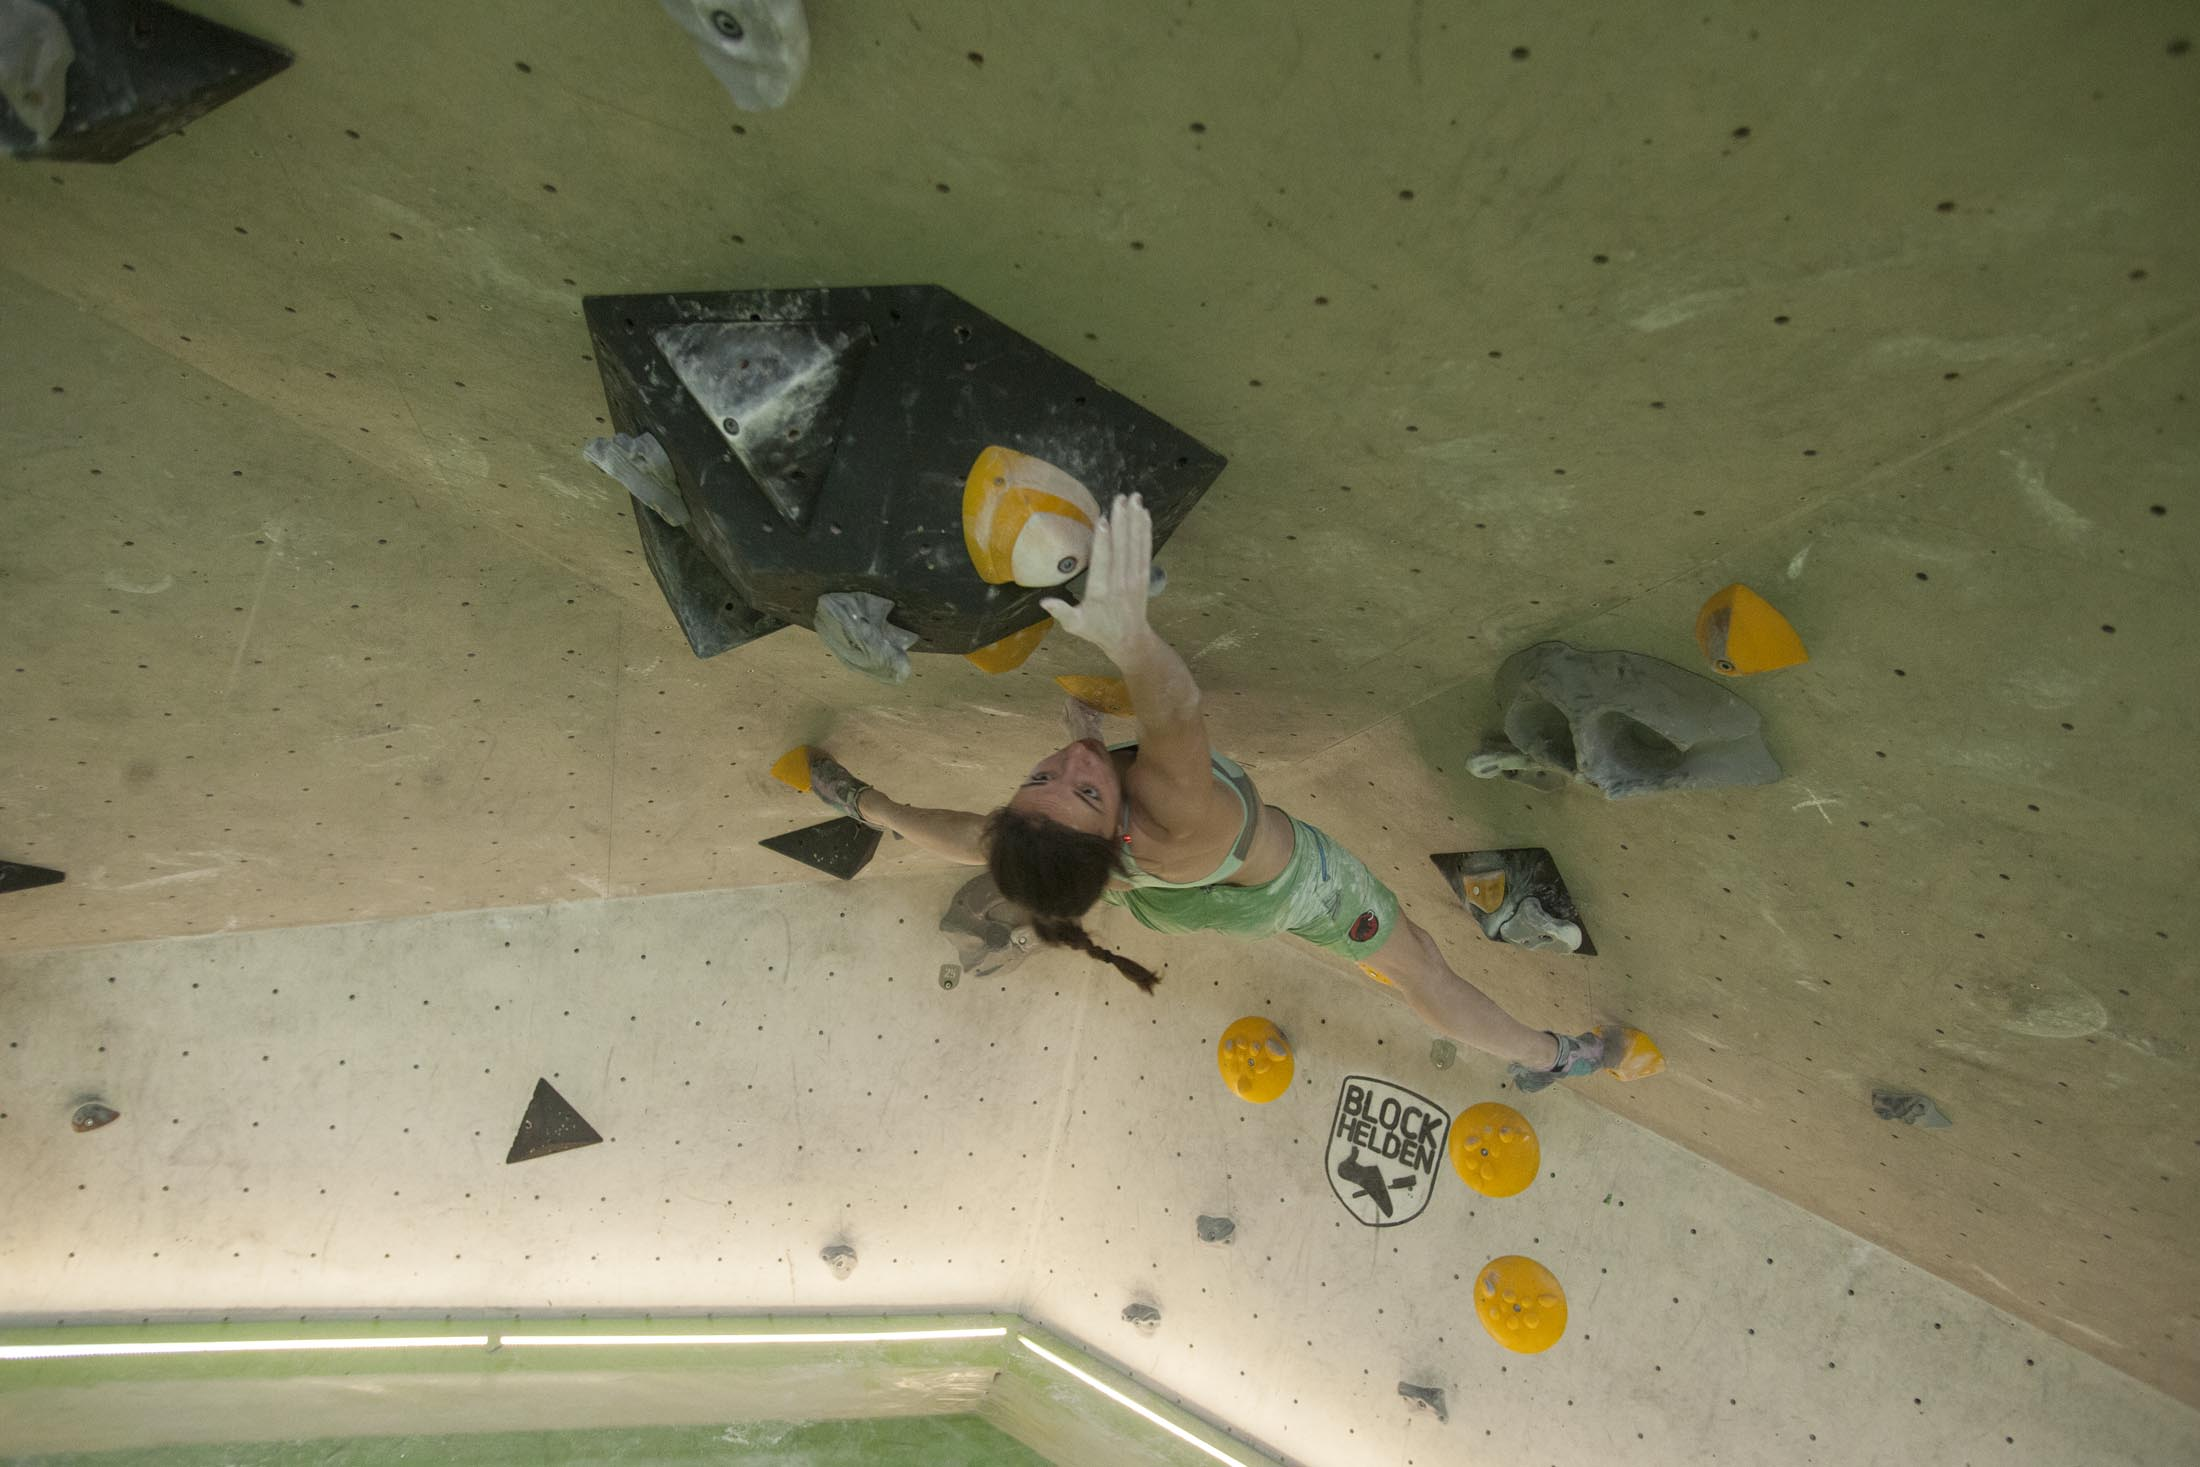 Juliane Wurm, internationaler bouldercup Frankenjura, BLOCKHELDEN Erlangen, Bergfreunde.de, Mammut07092016028